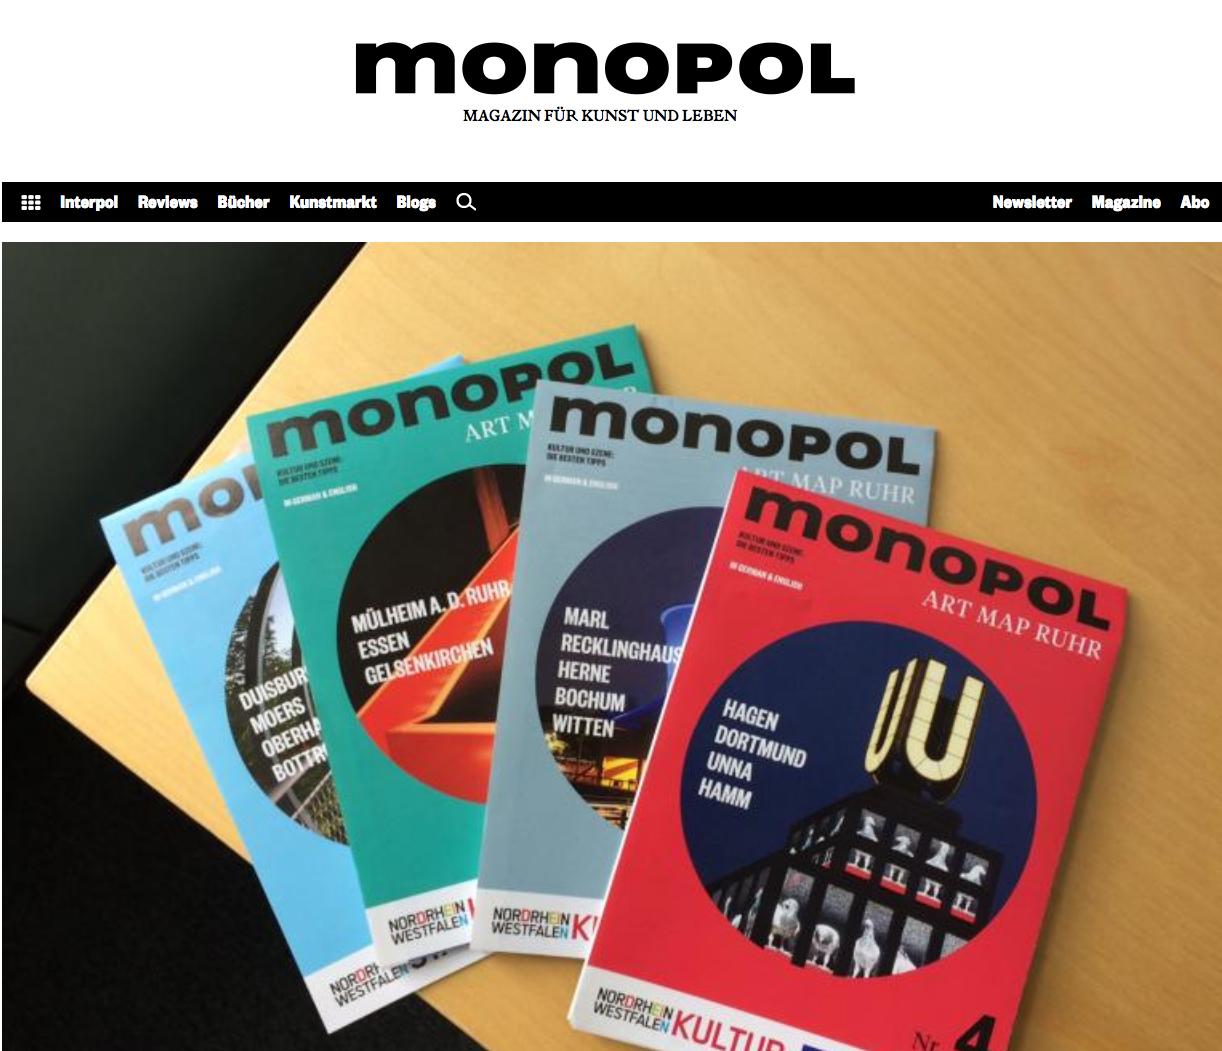 monopol-pfaller-artmap-ruhr-7